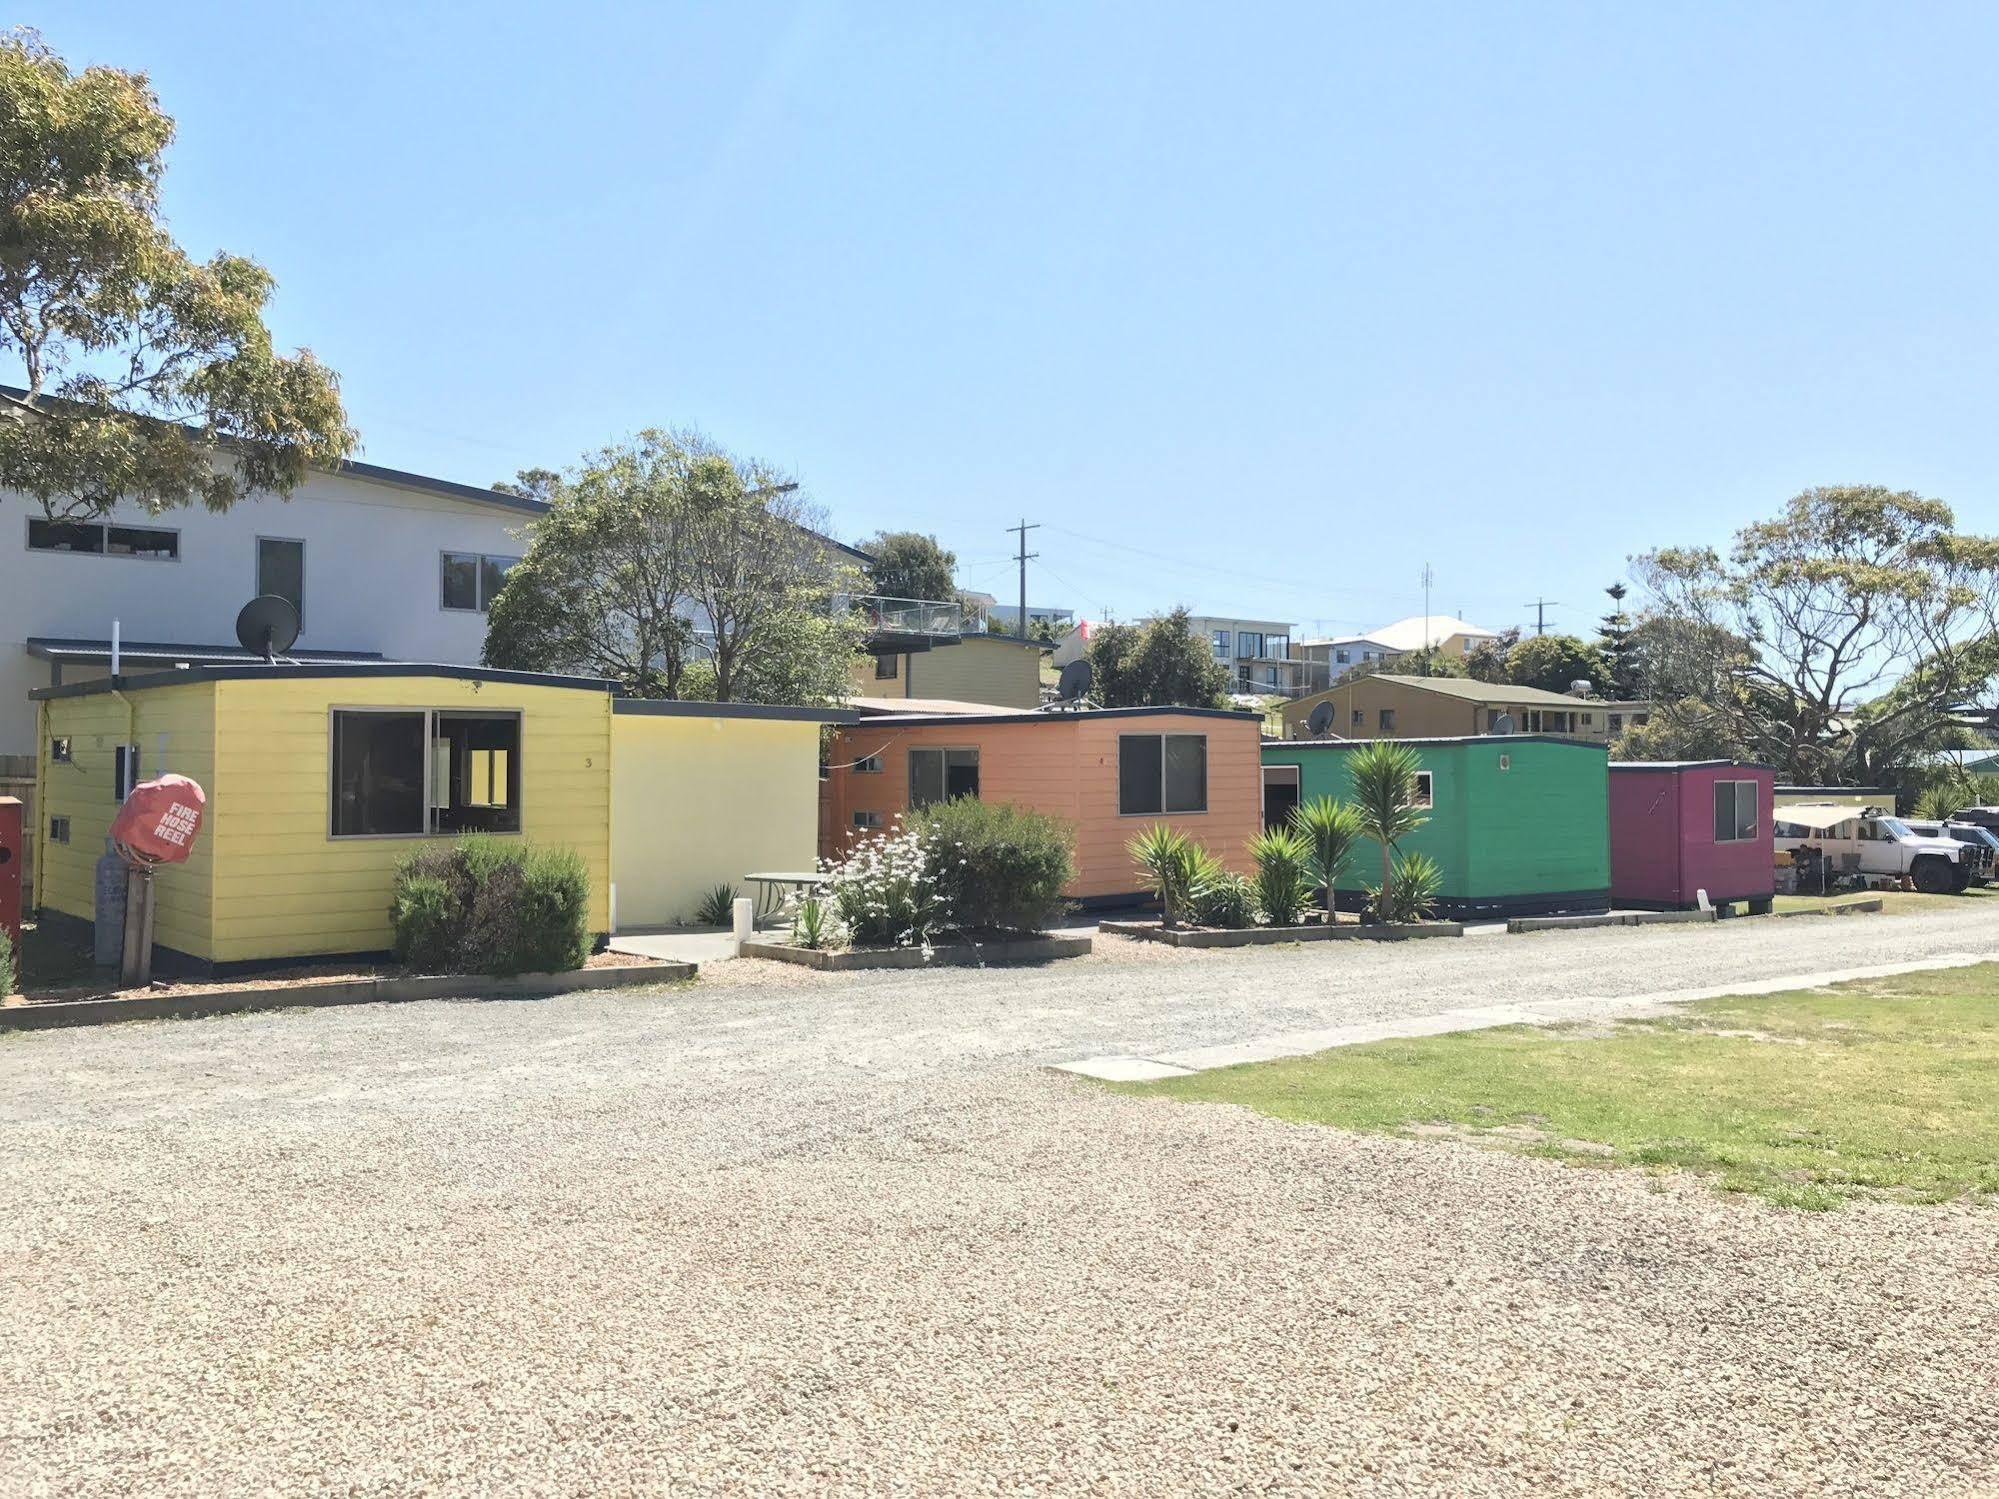 The Waterwheel Beach Cabins Caravan Park